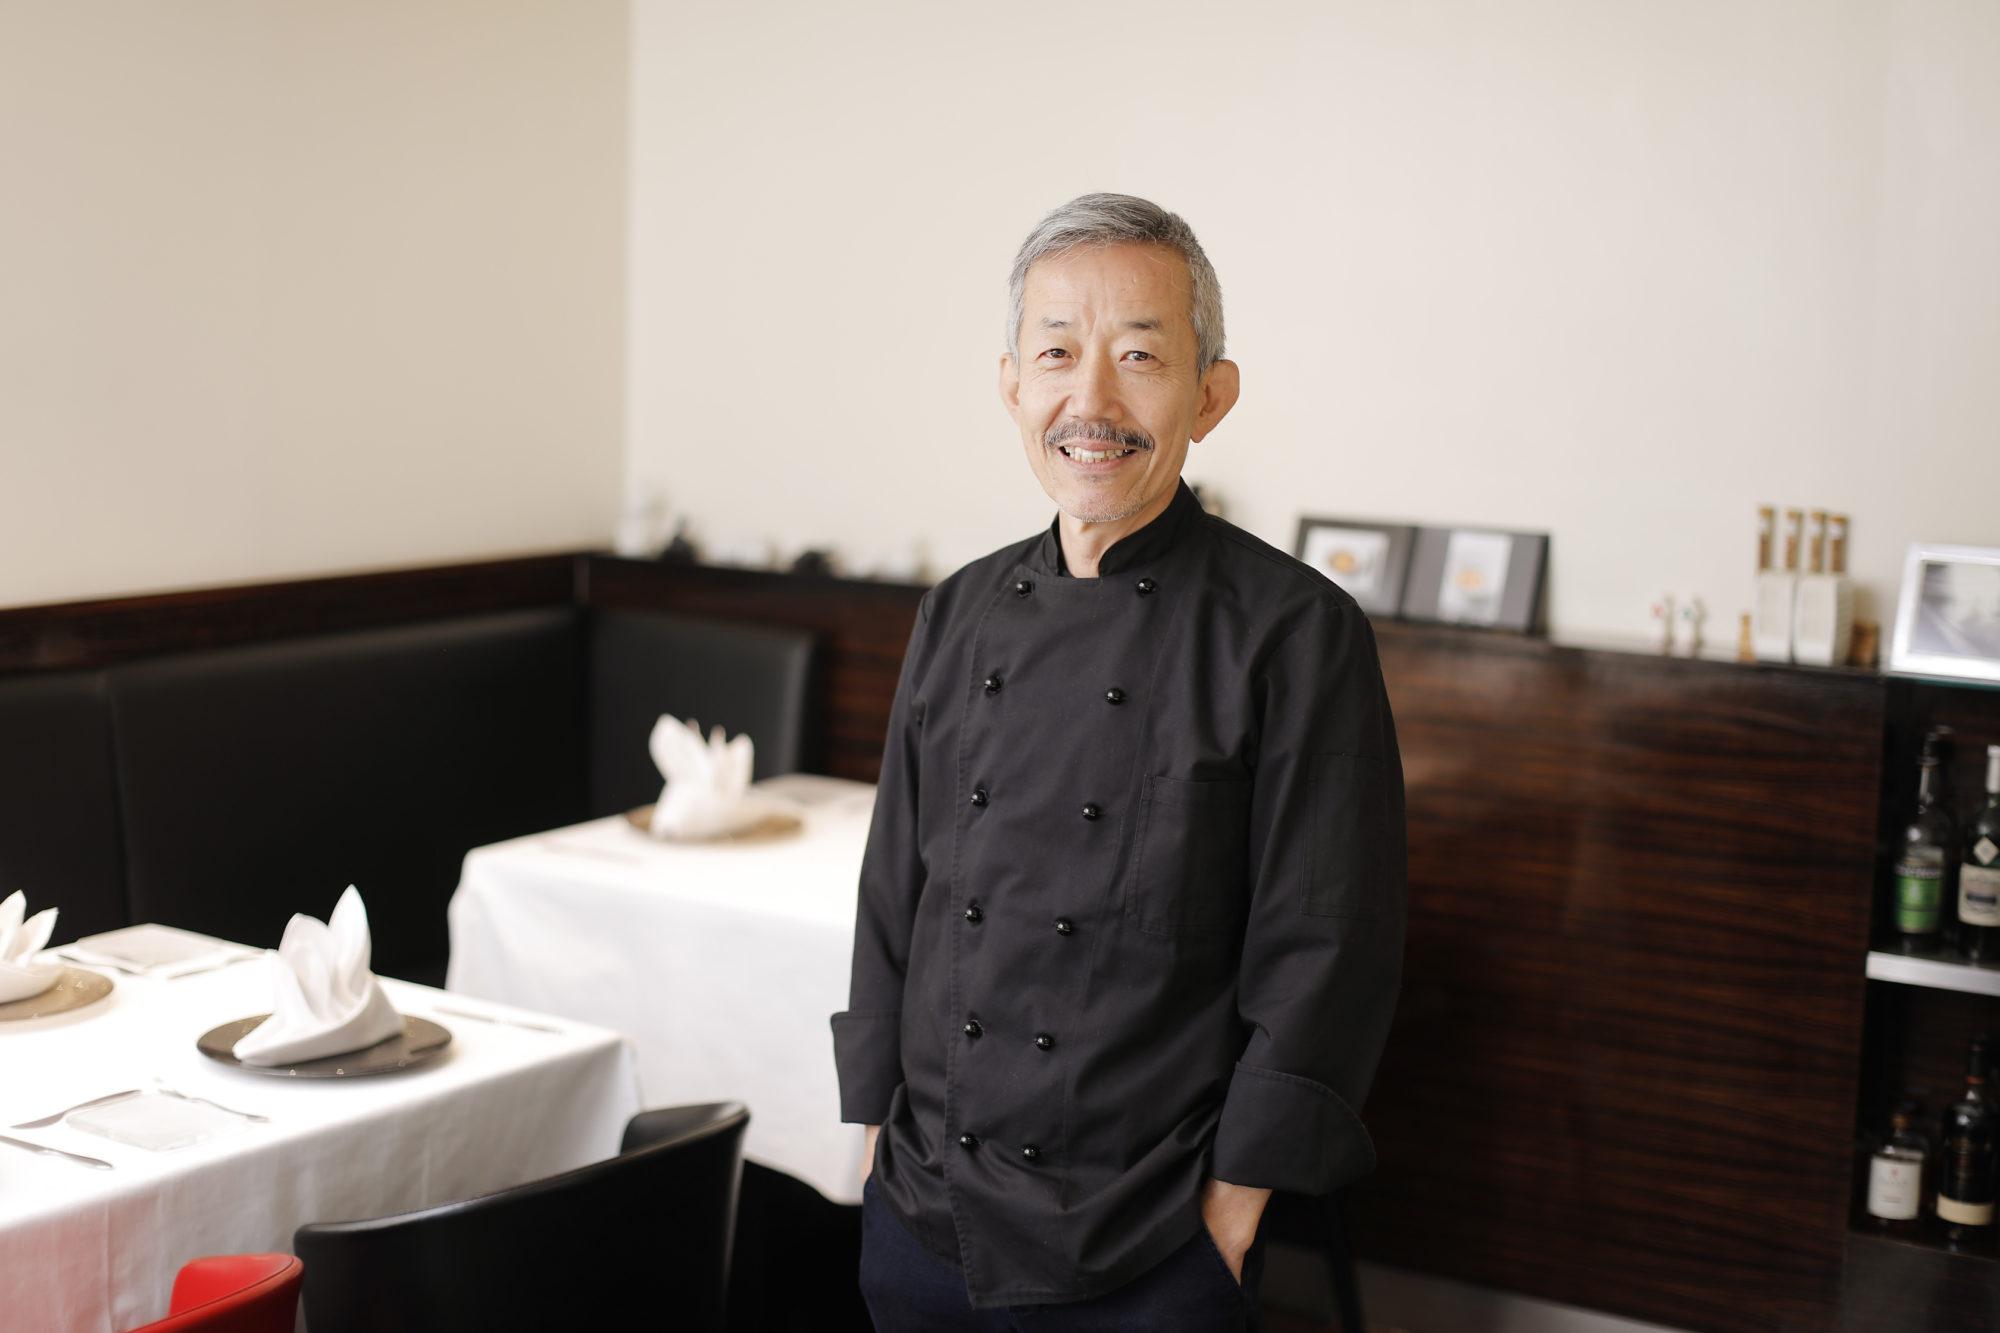 Le Mange-Tout(ル・マンジュ・トゥー) 谷昇